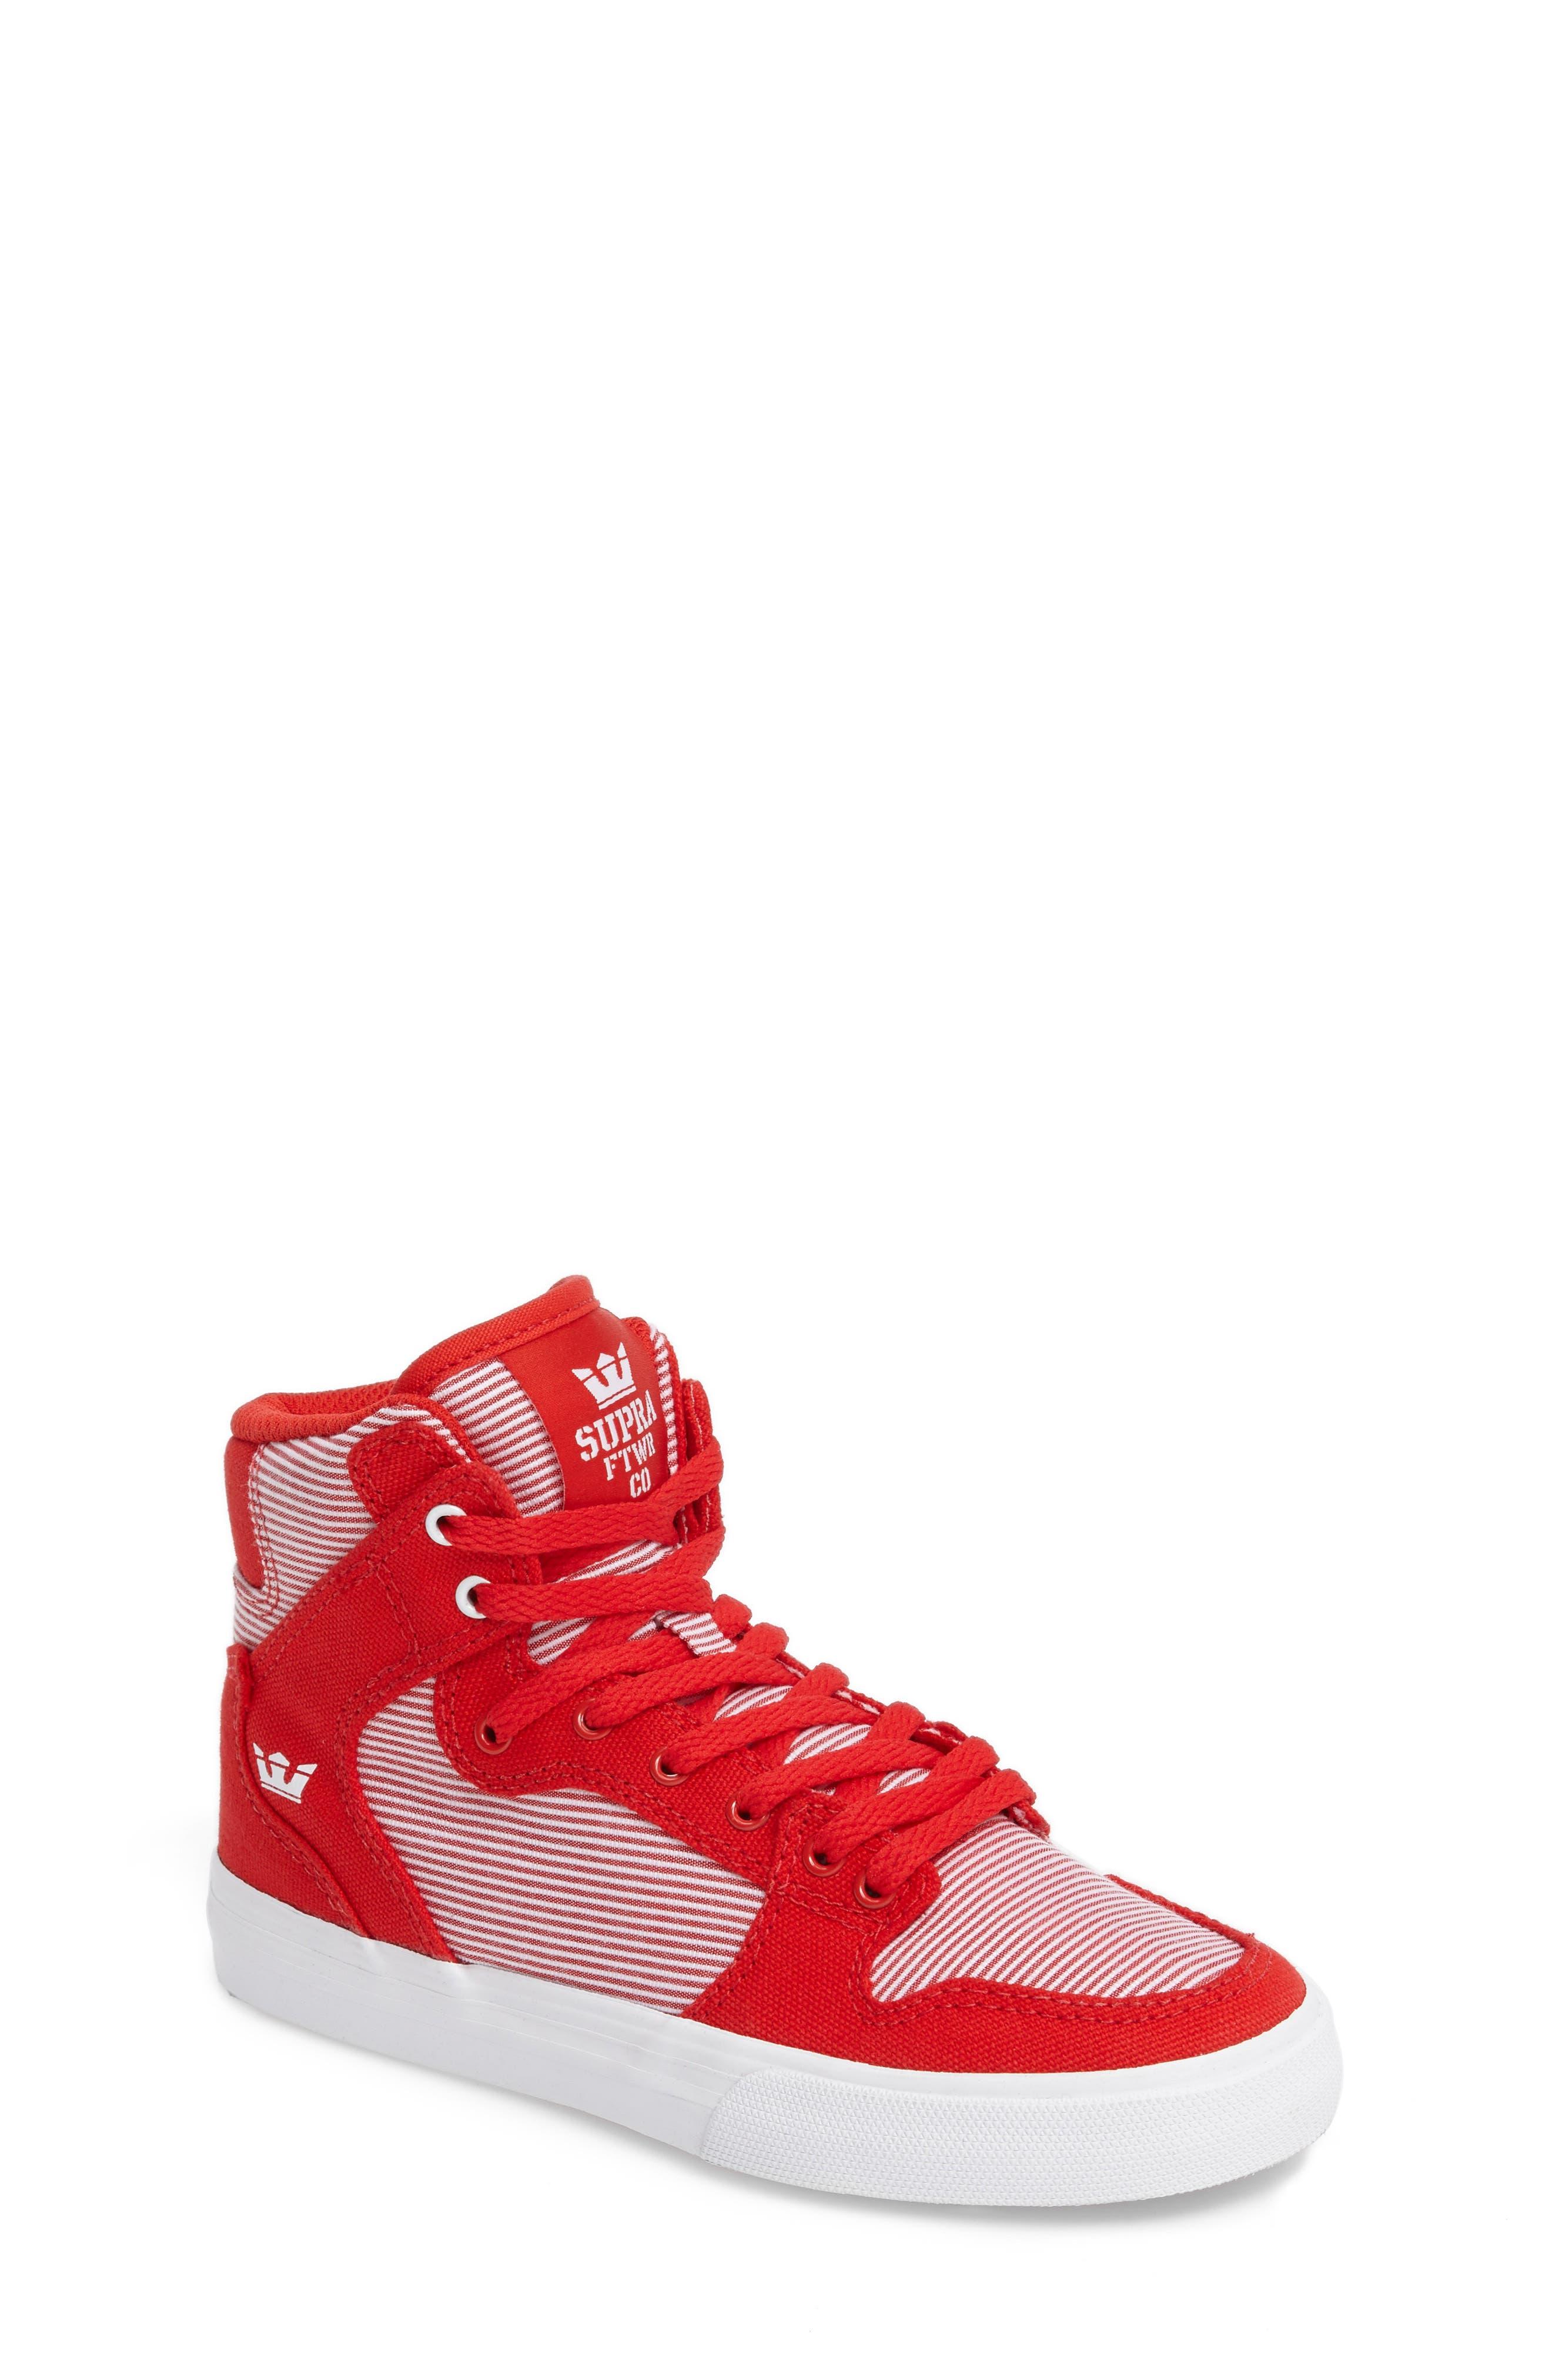 Alternate Image 1 Selected - Supra Vaider High Top Sneaker (Toddler, Little Kid & Big Kid)